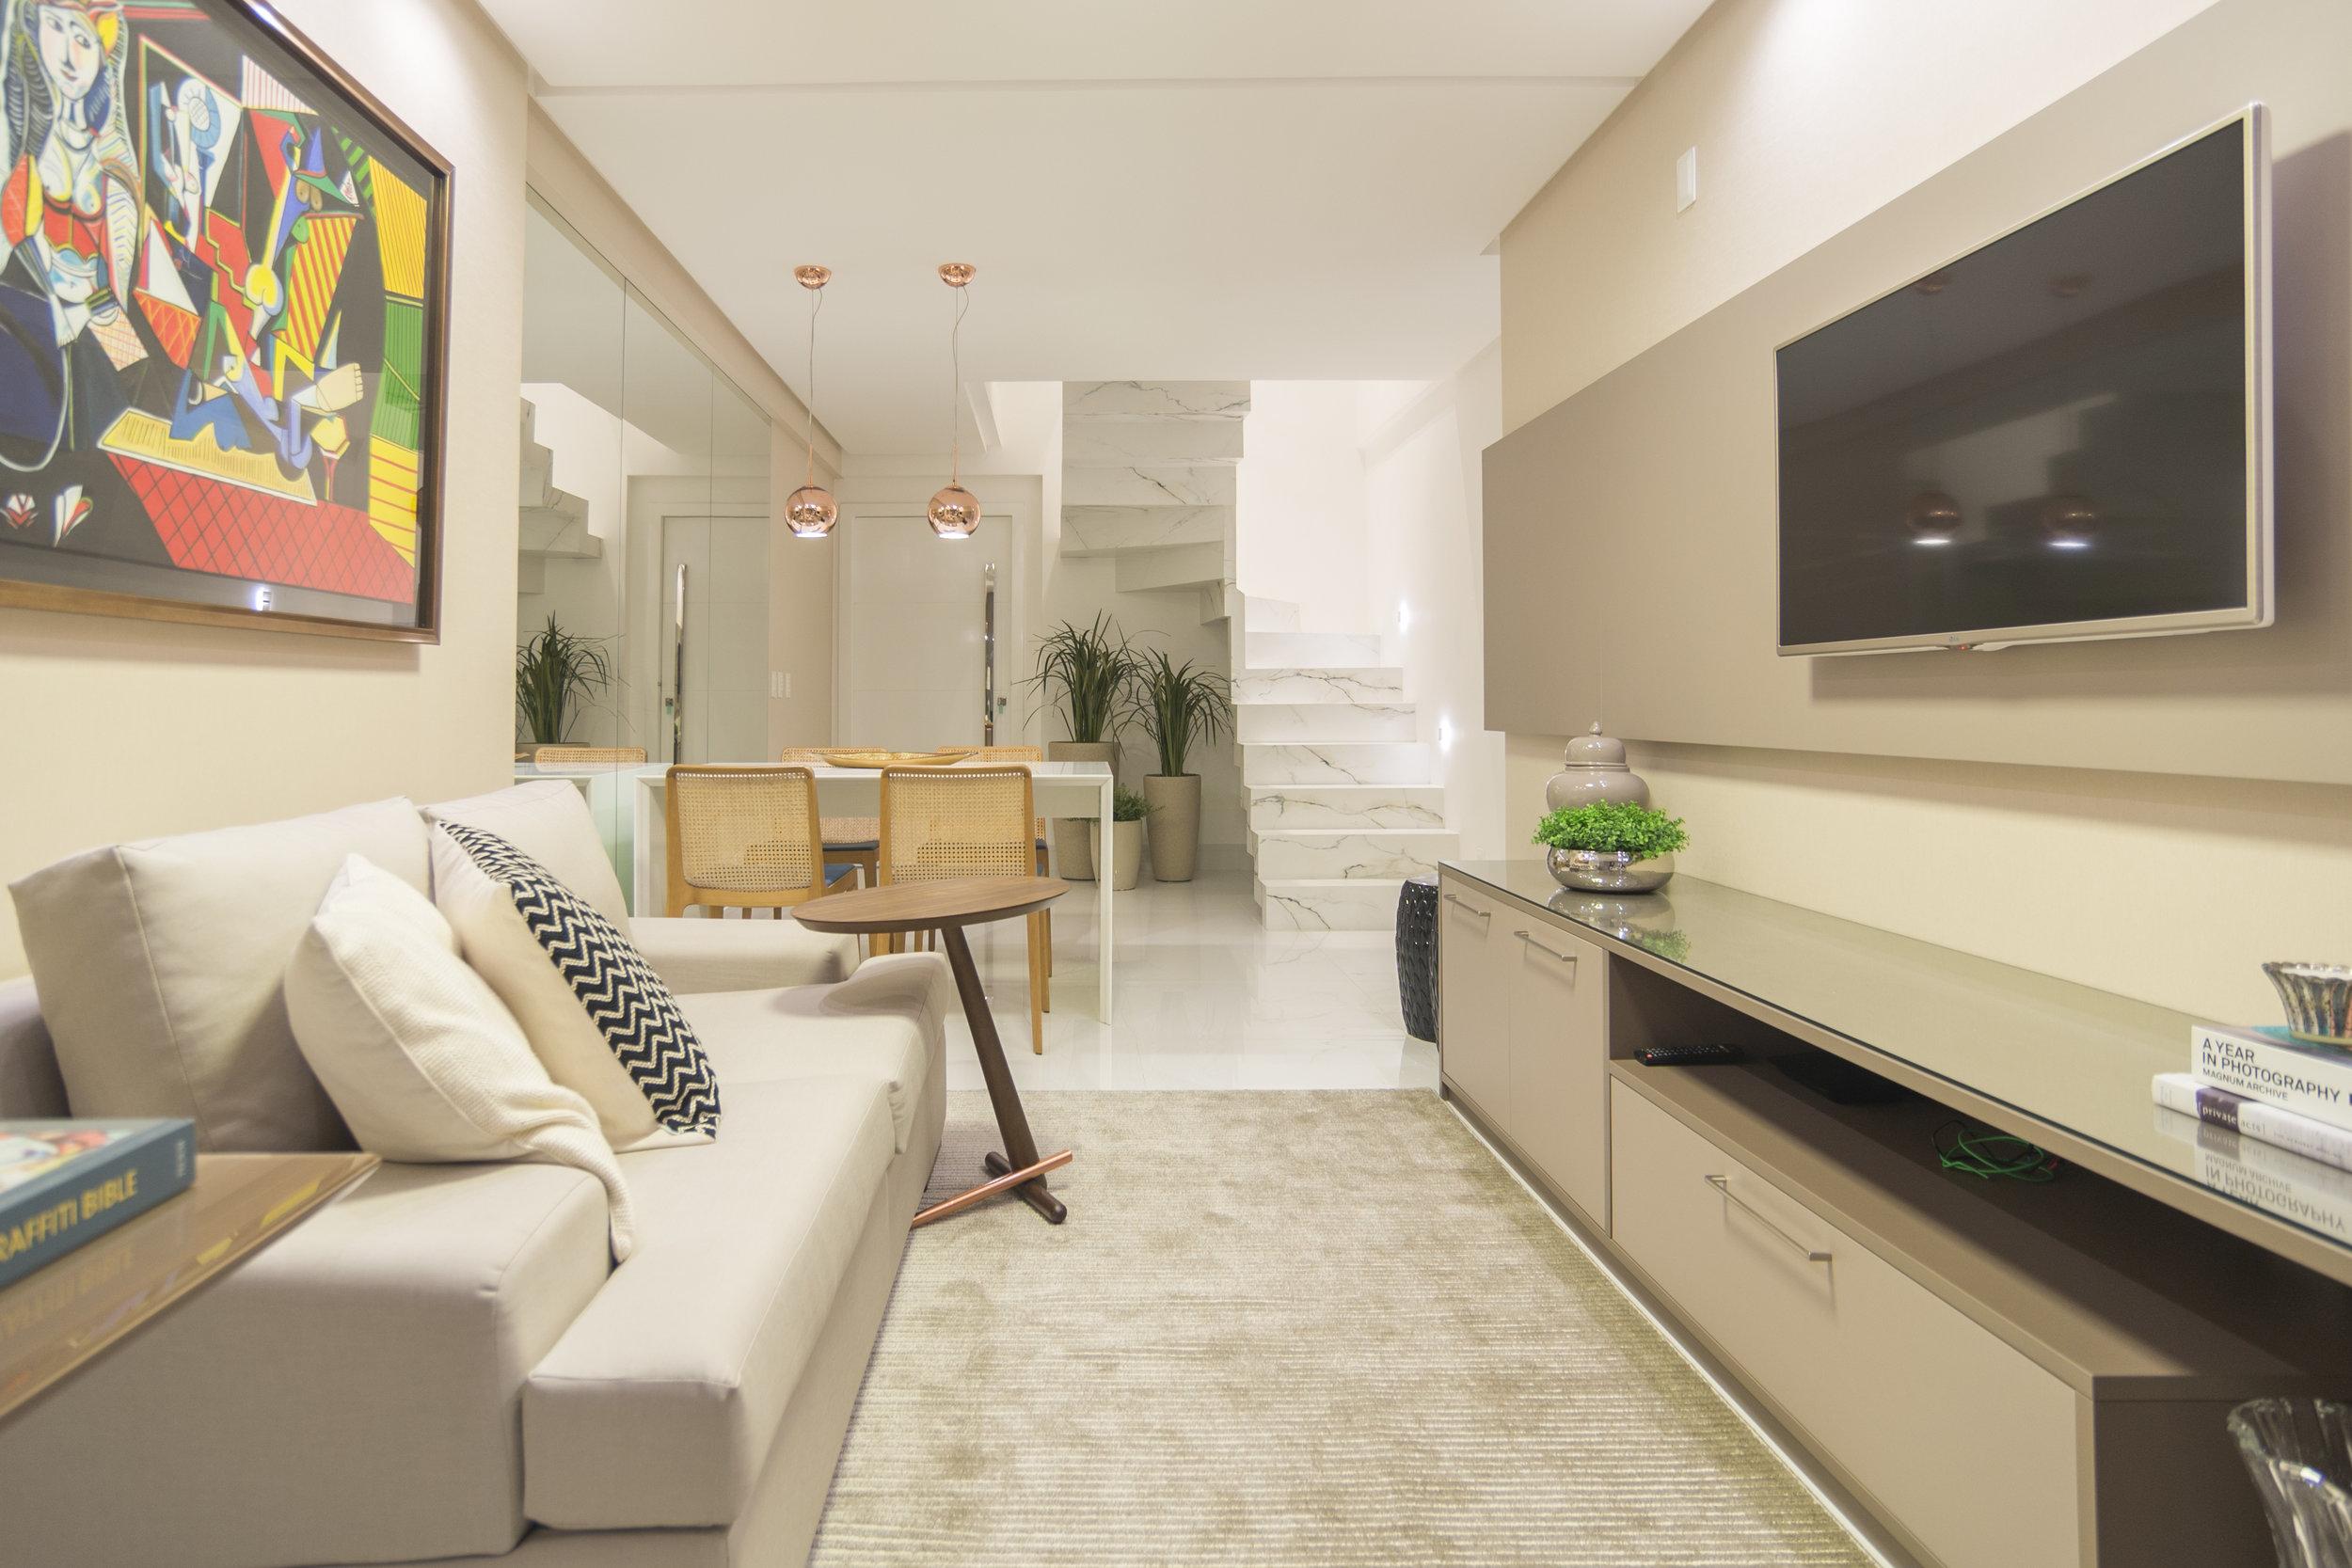 projeto-arquitetonico-robertoindira-duo-arquitetura-apartamentos-estar-07.jpg